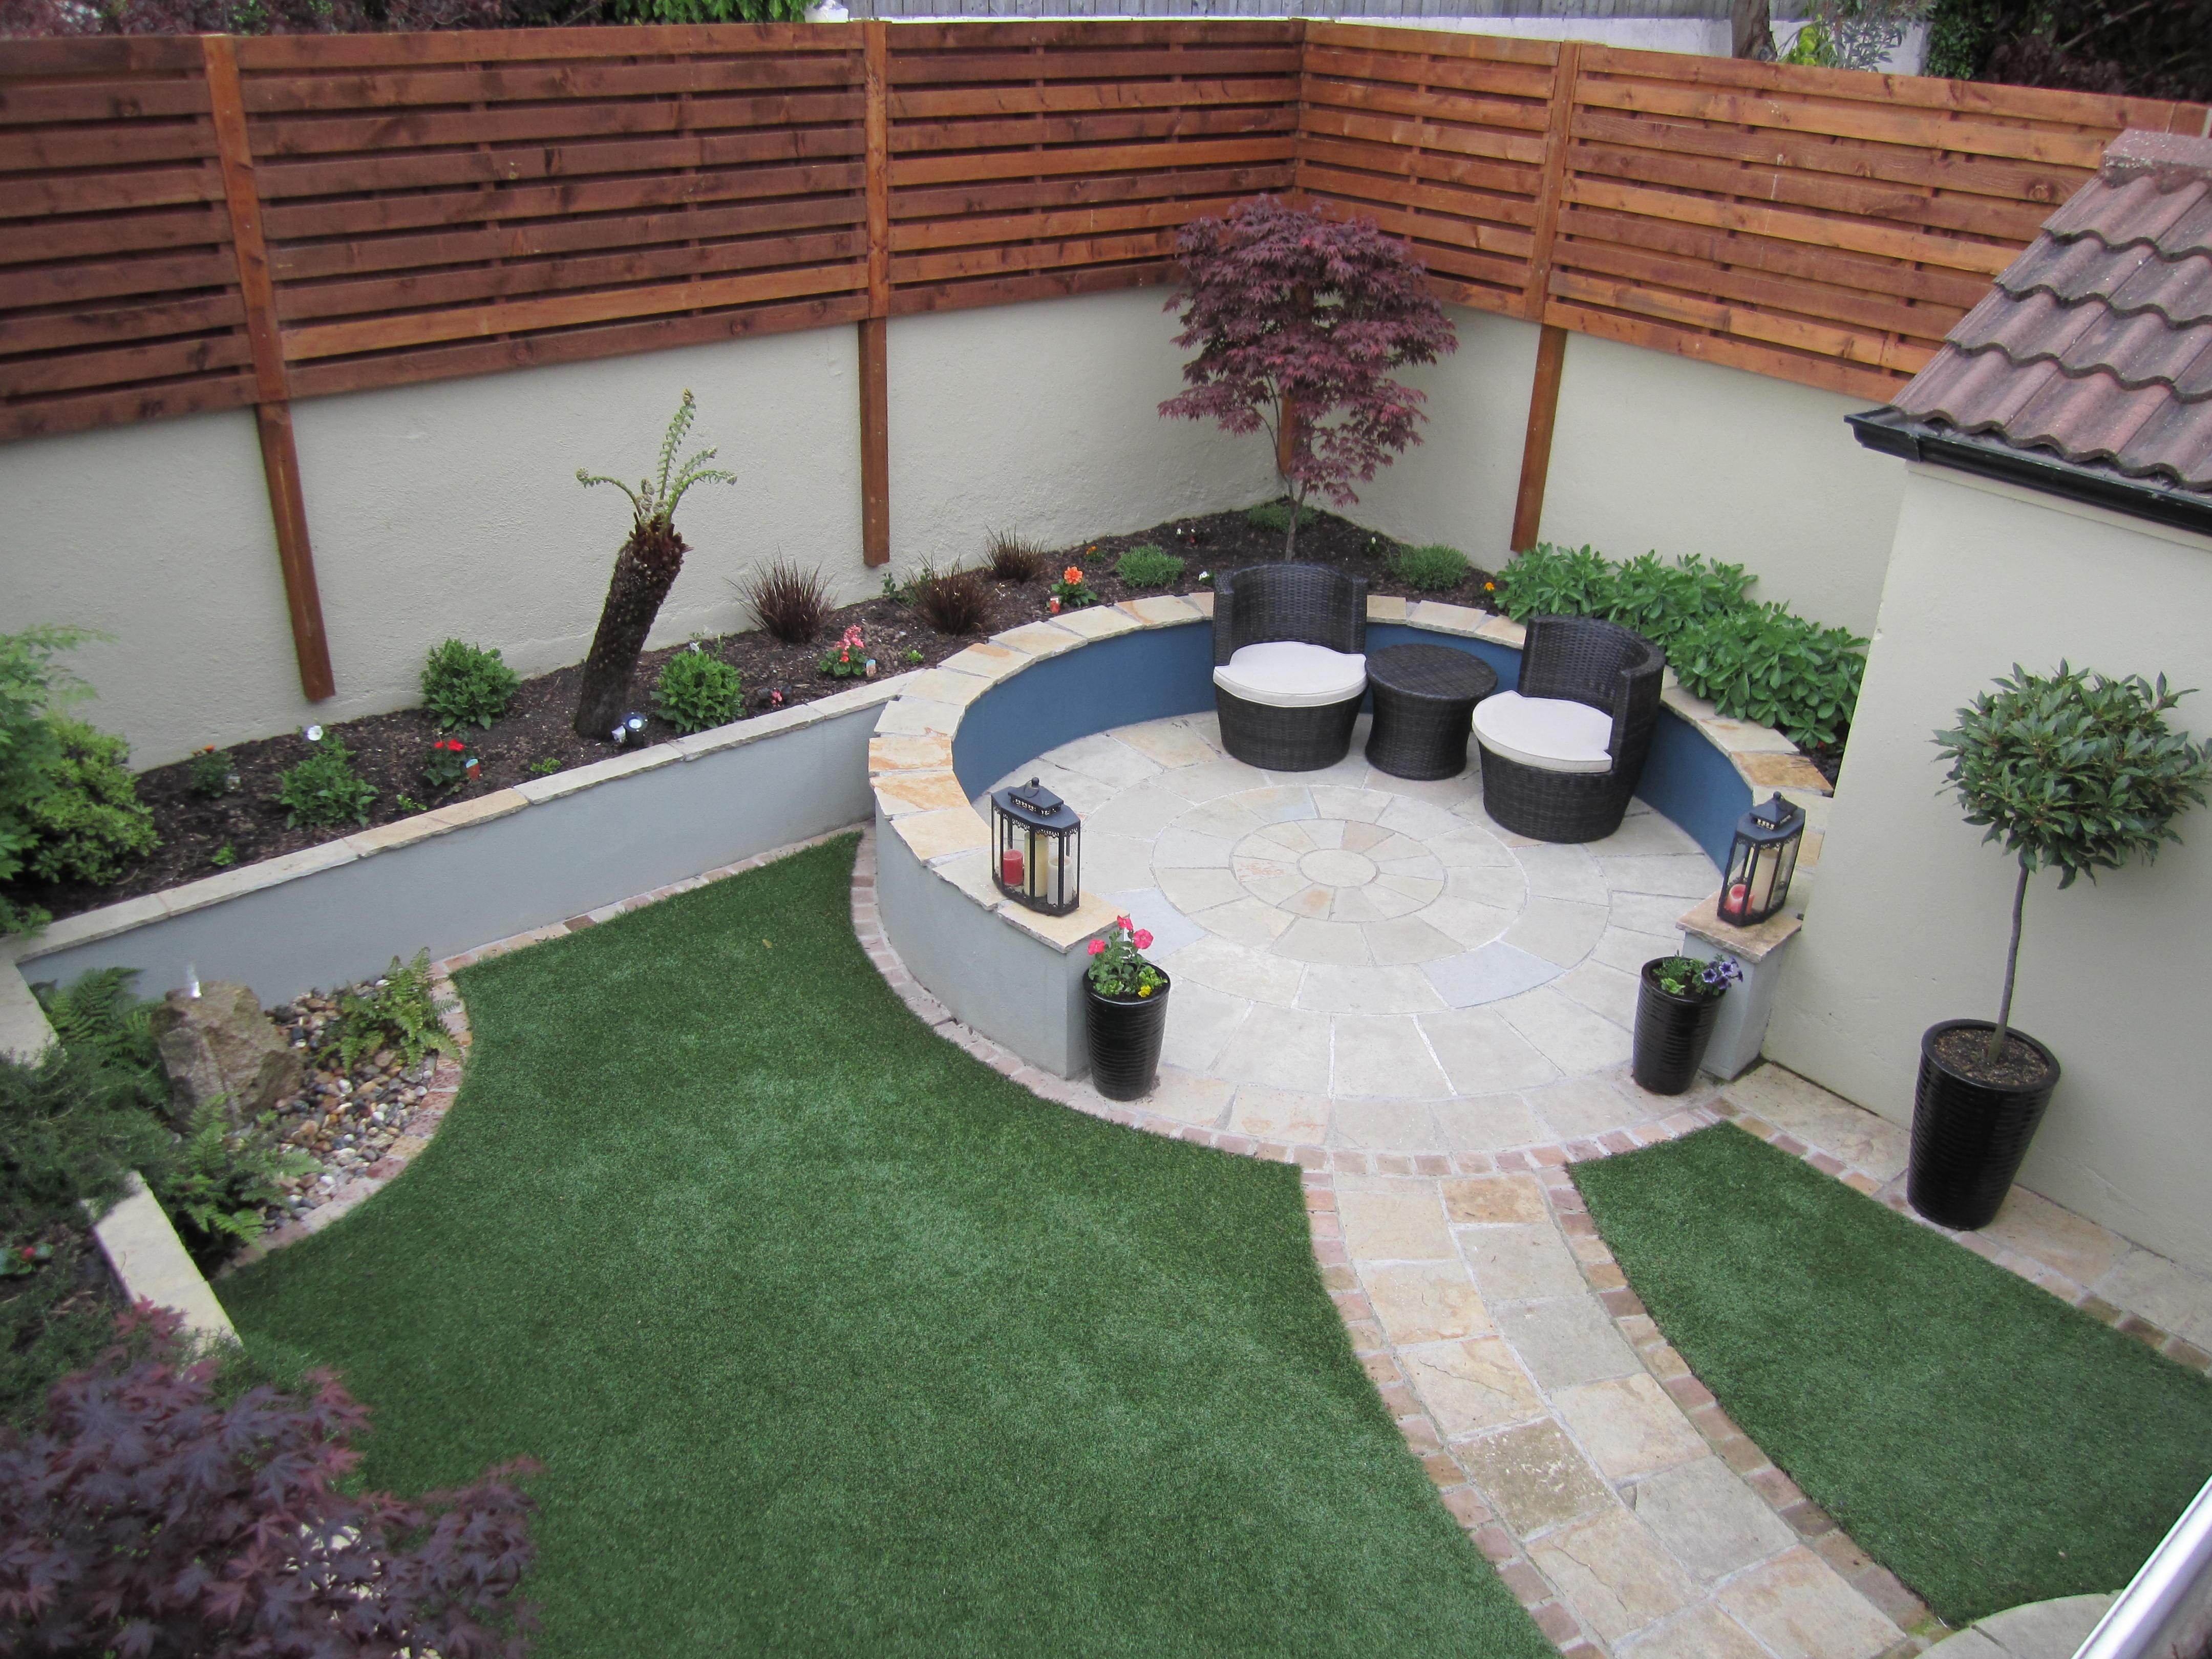 Low Maintenance Garden Design Dublin, Wicklow - Landscaping.ie